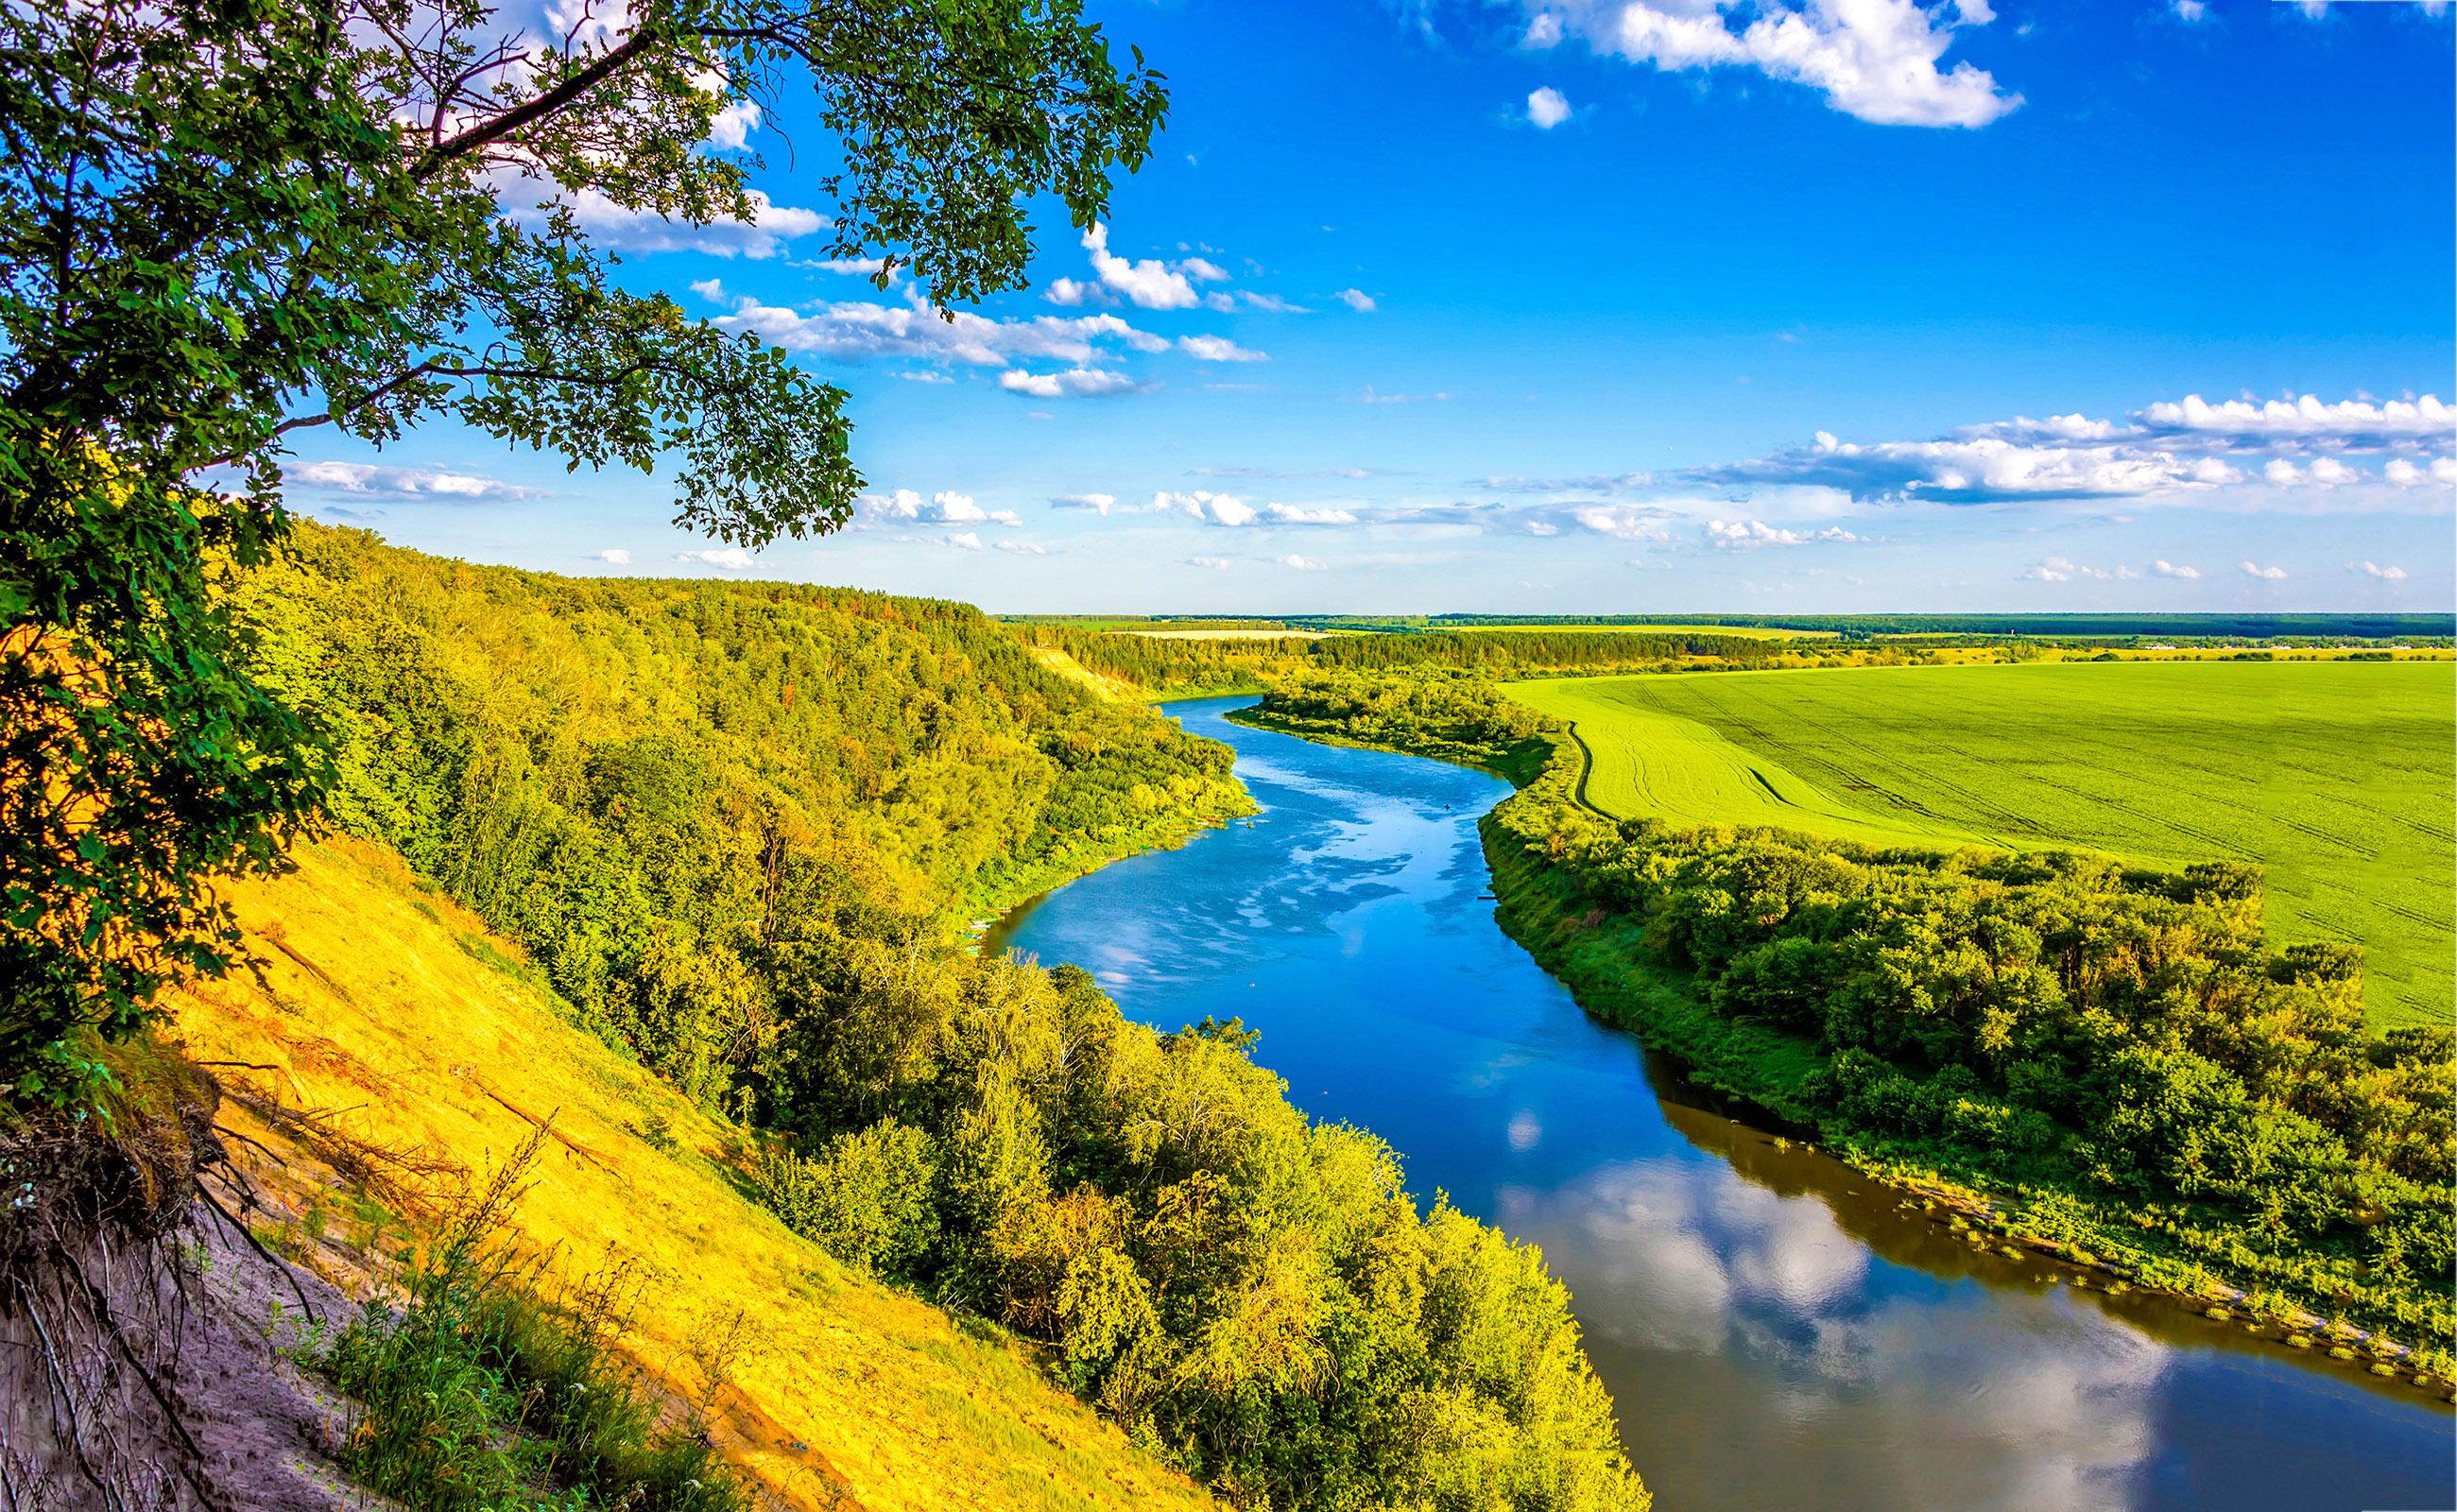 Paisagem do Summer Green Valley River1-editado